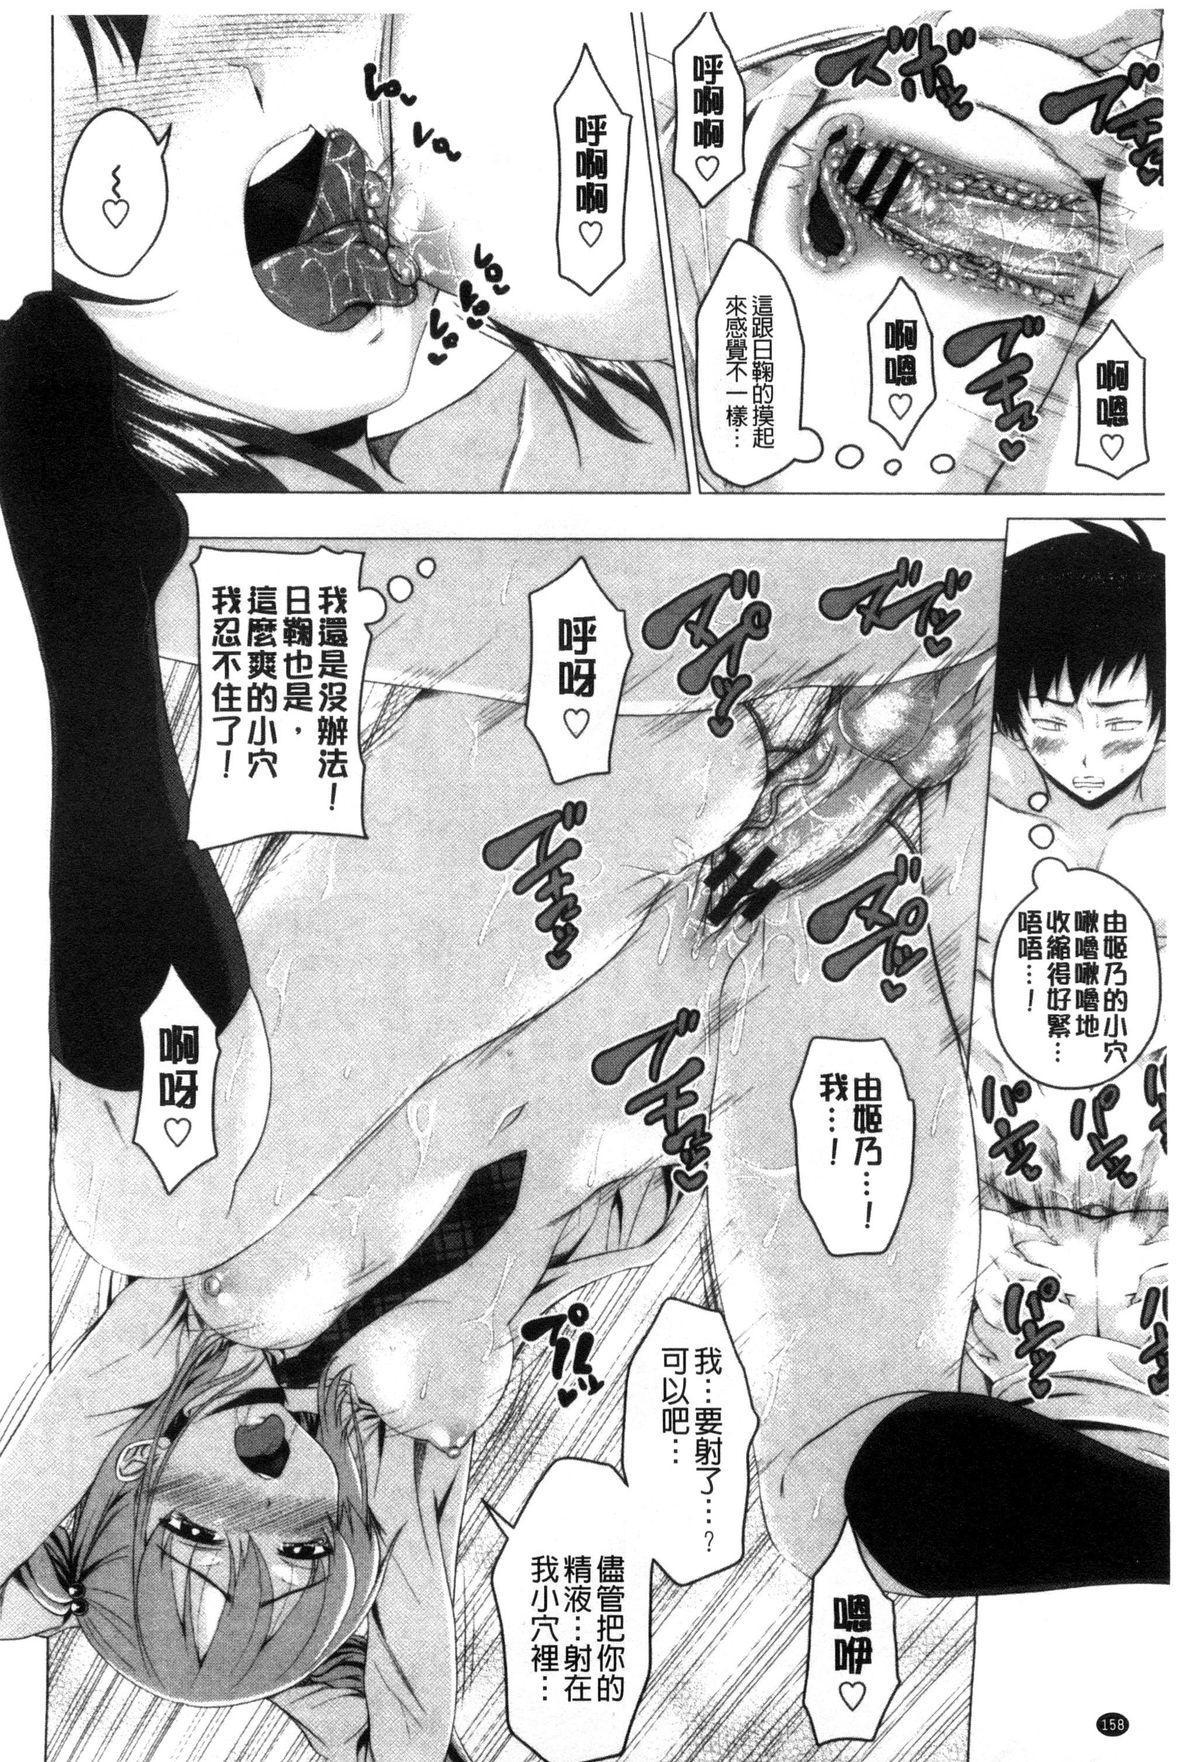 [Arsenal] Guchu-Nure-Otome l 咕啾的濕濡乙女 [Chinese] 161